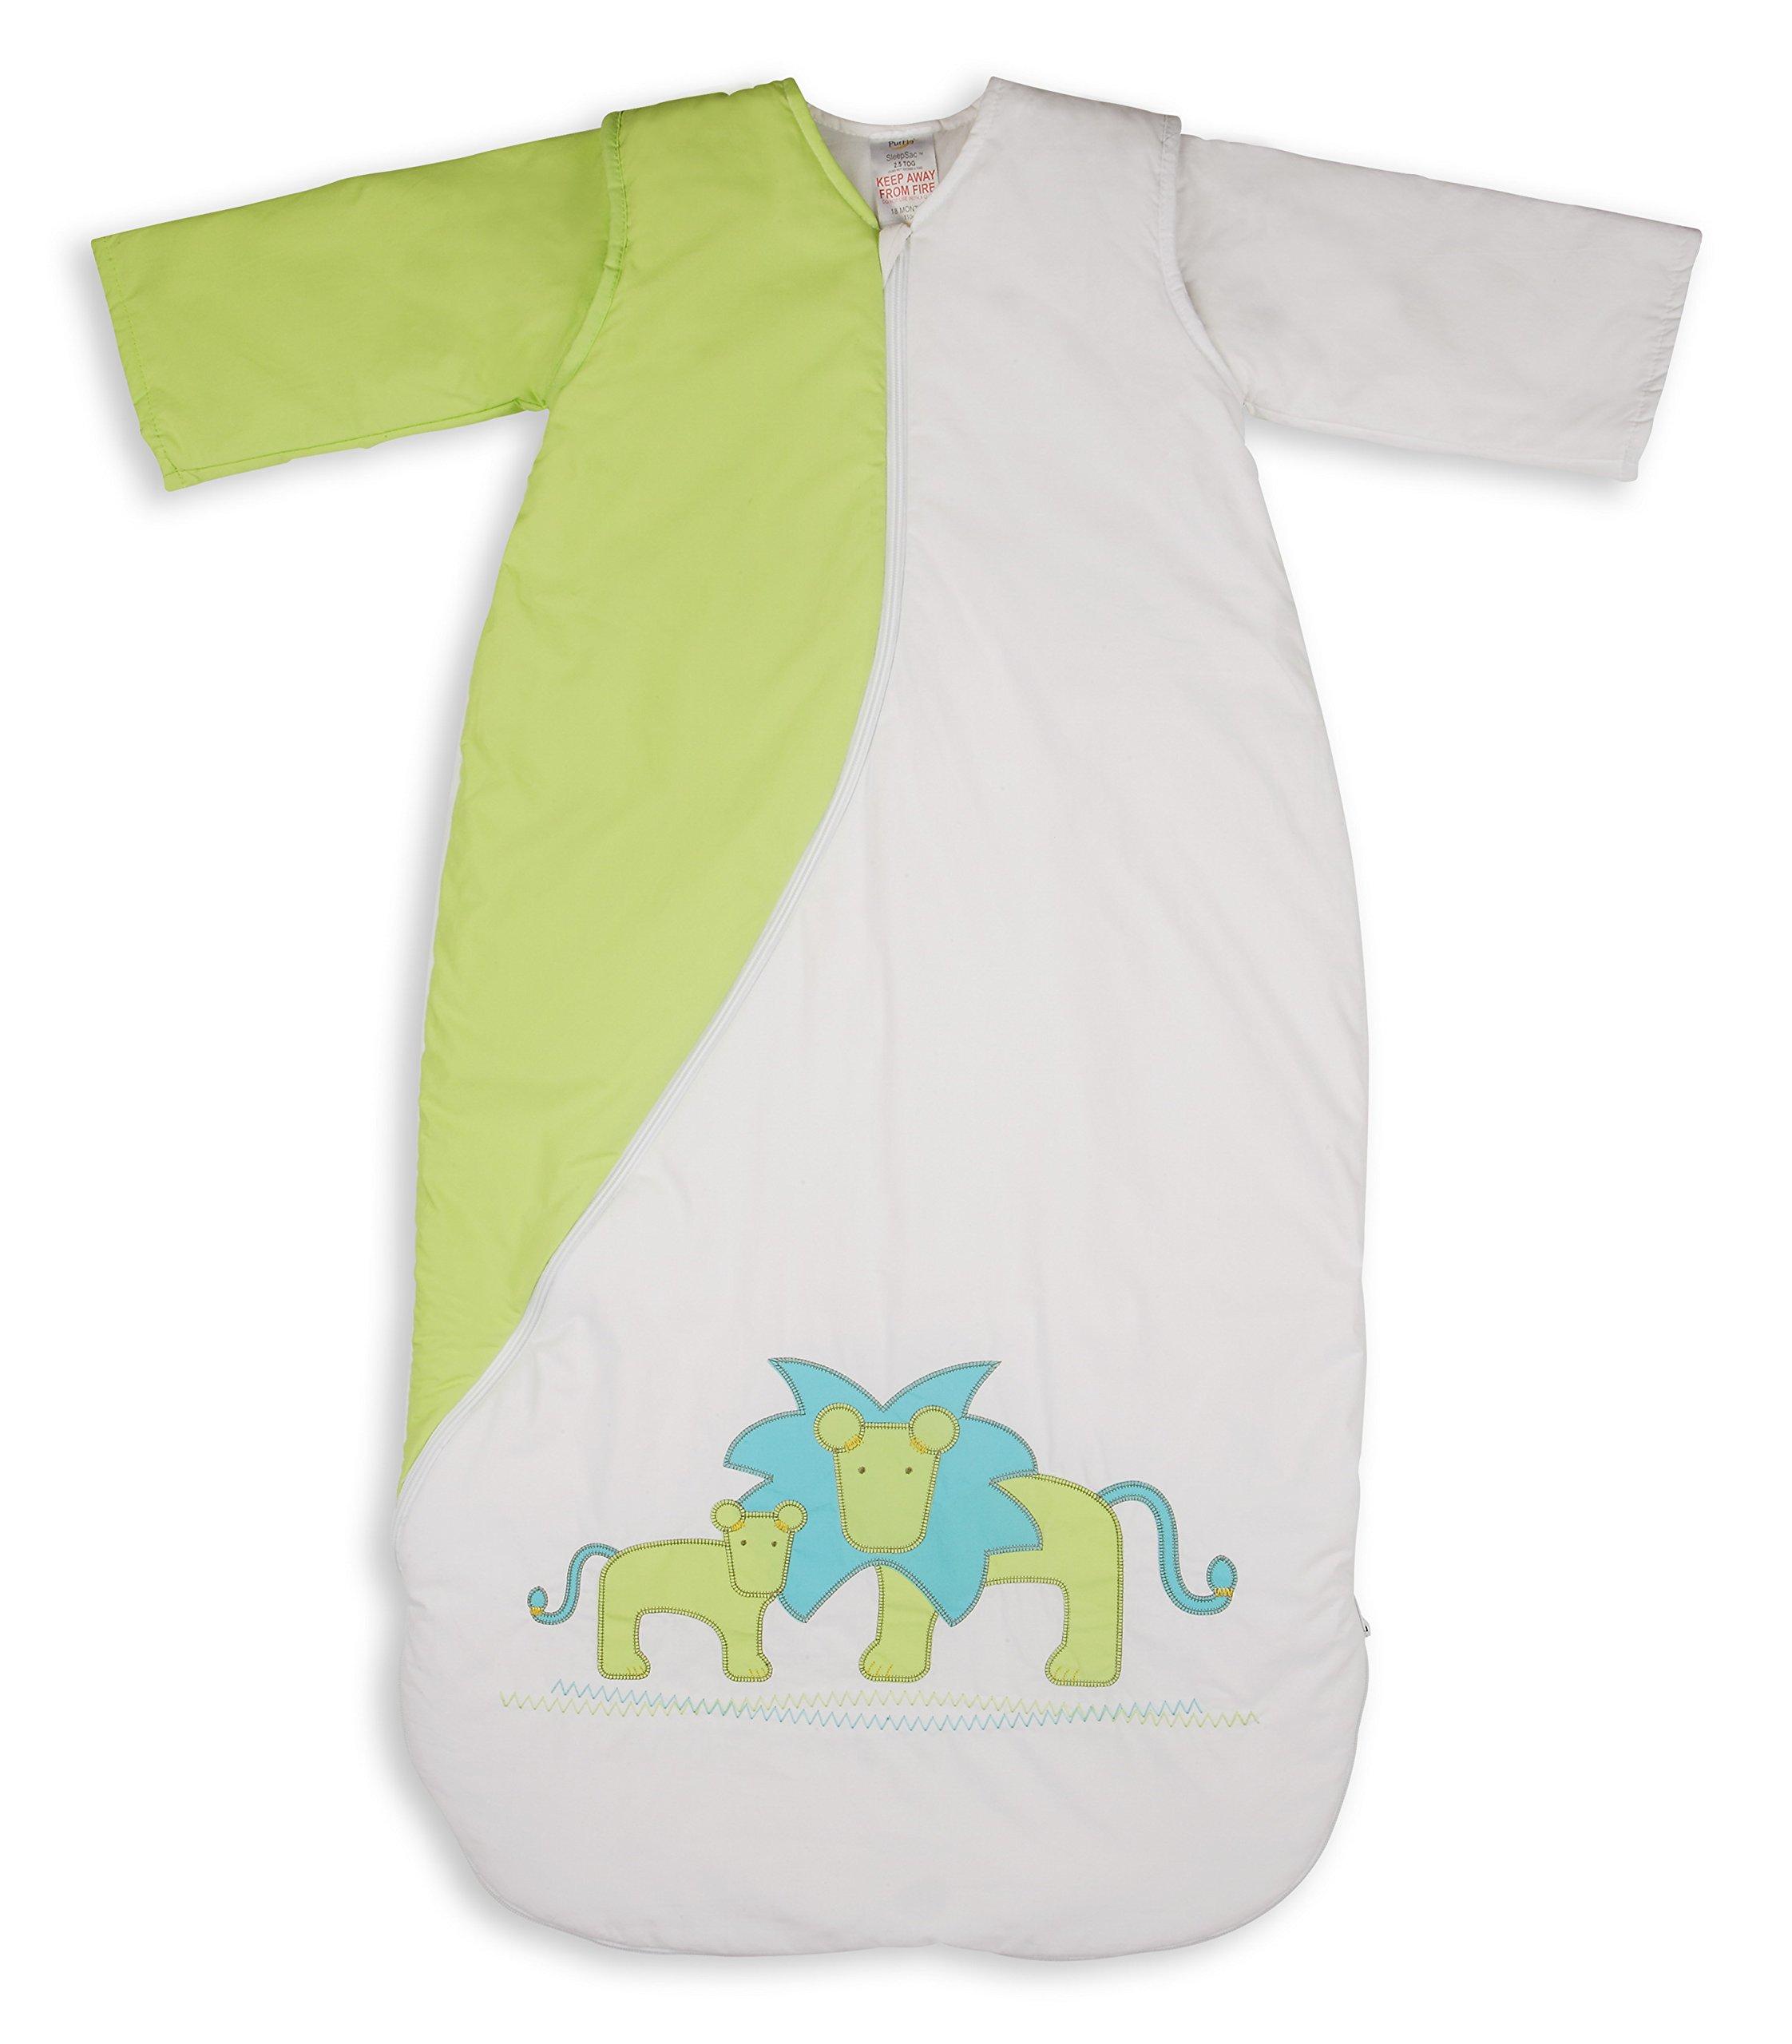 PurFlo SleepSac Bordado 1.0 TOG (león Kiwi, 18 Meses +) Saco de Dormir para bebé